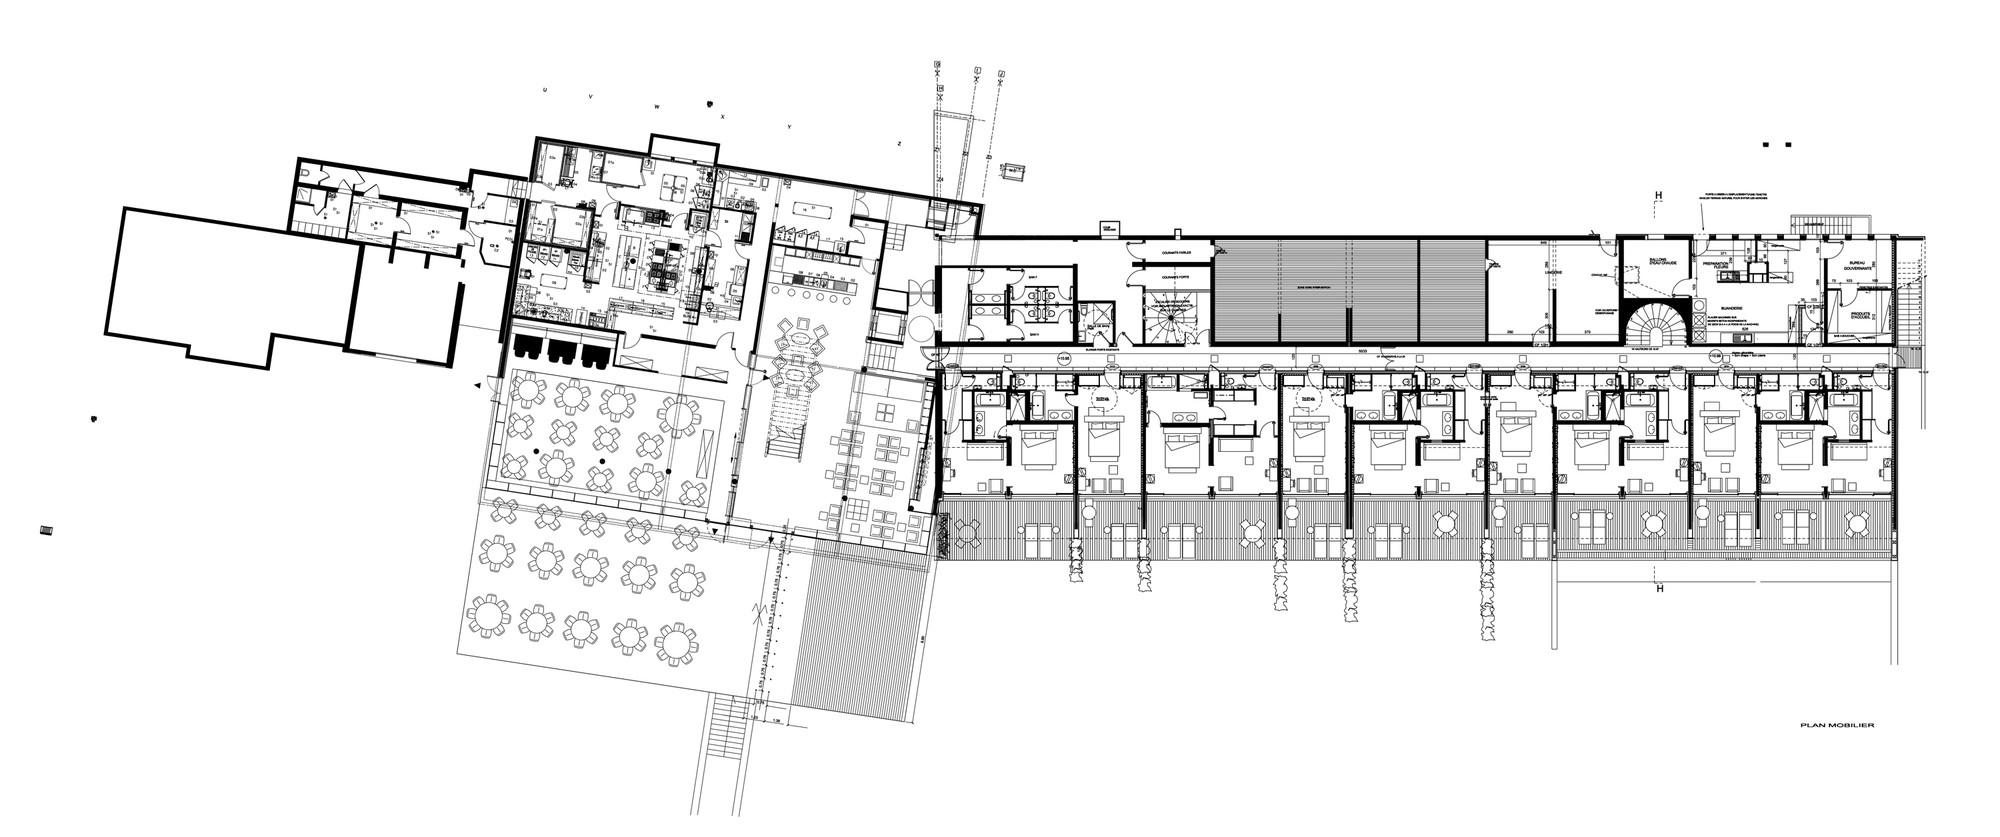 galeria de hotel casadelmar jean fran ois bodin 27. Black Bedroom Furniture Sets. Home Design Ideas